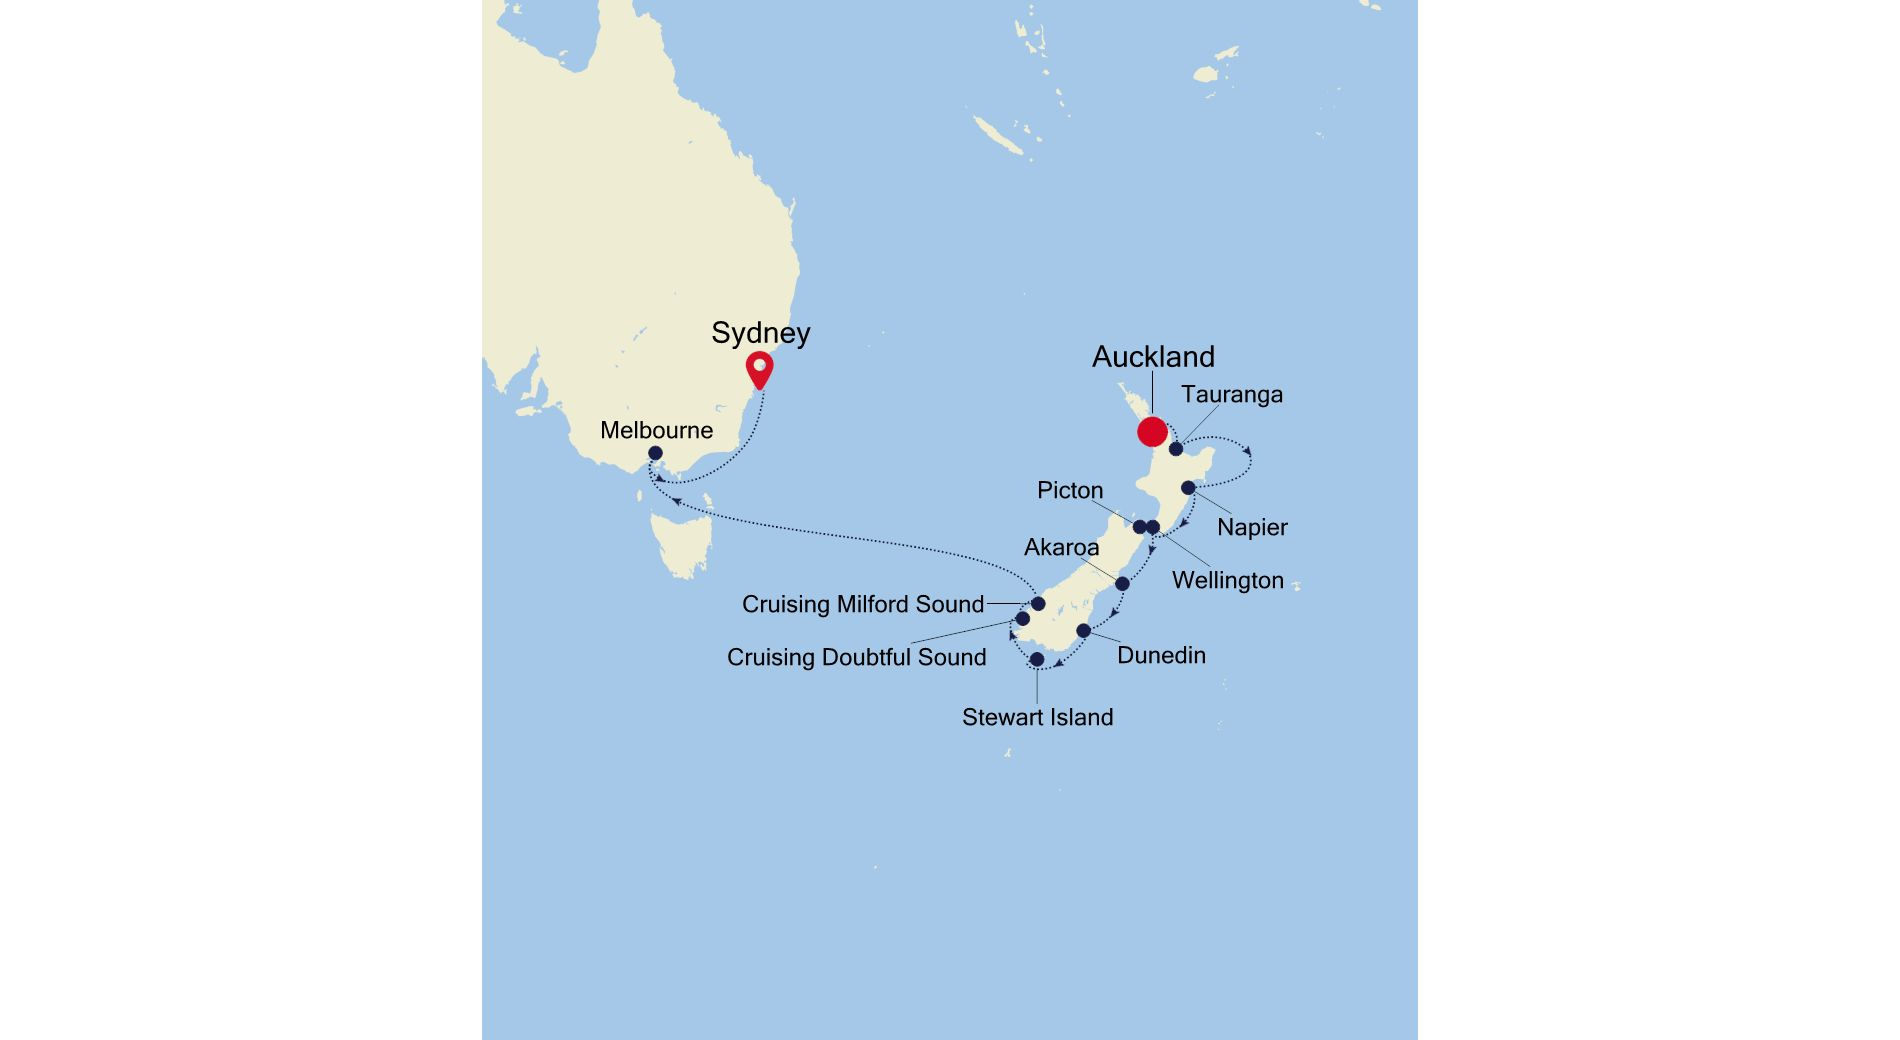 SS220320015 - Auckland à Sydney